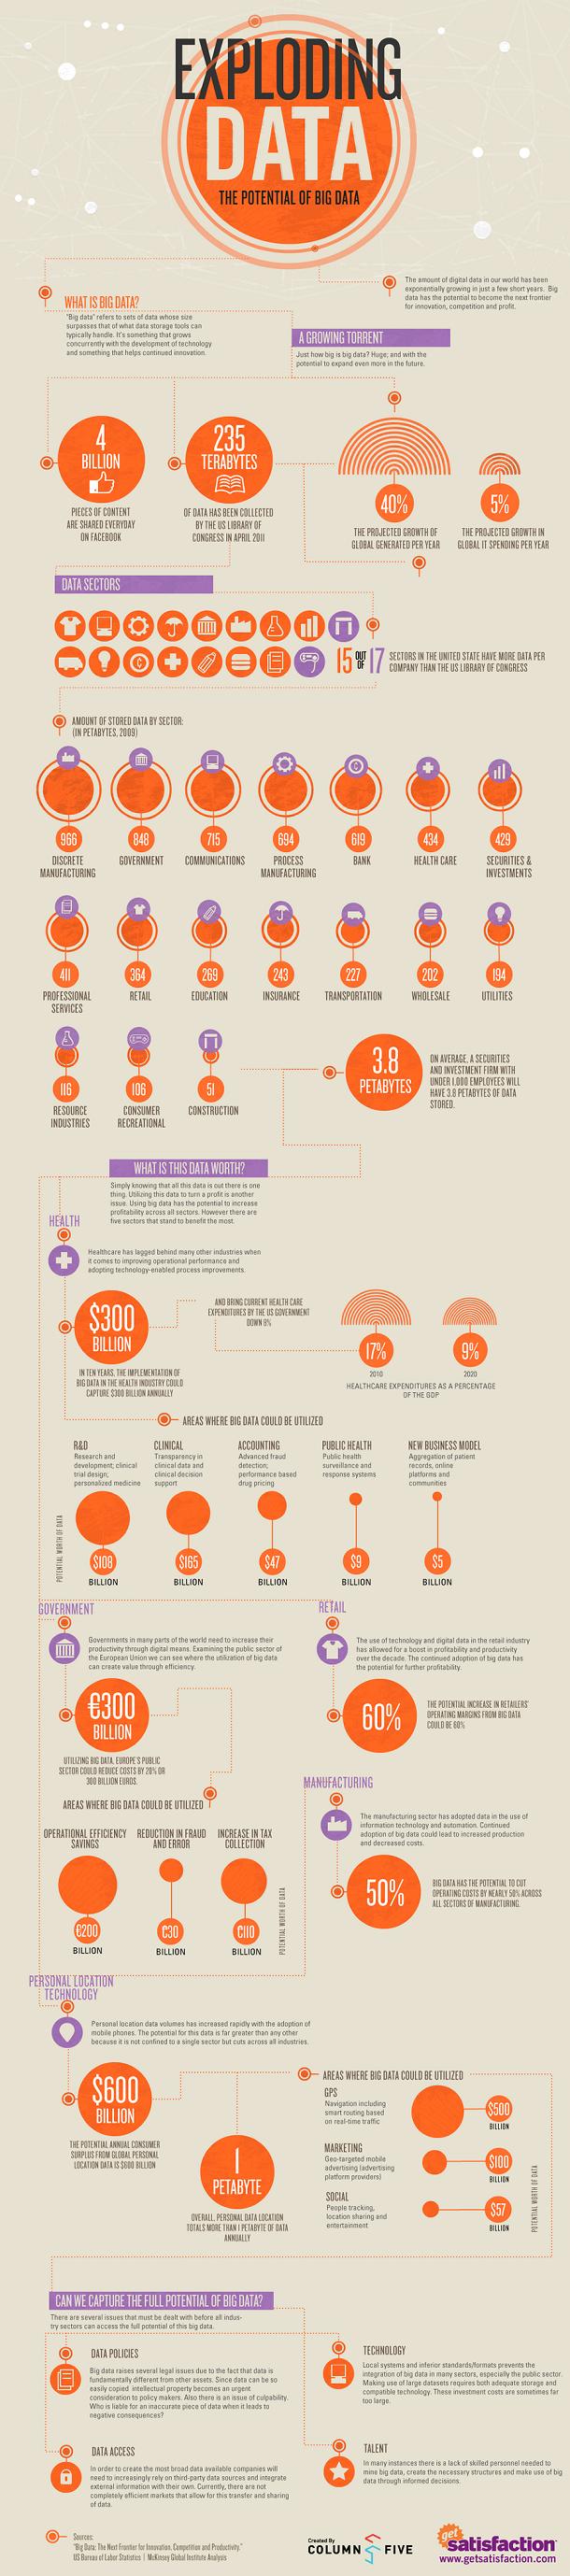 bigdata_infographic_0711 copy